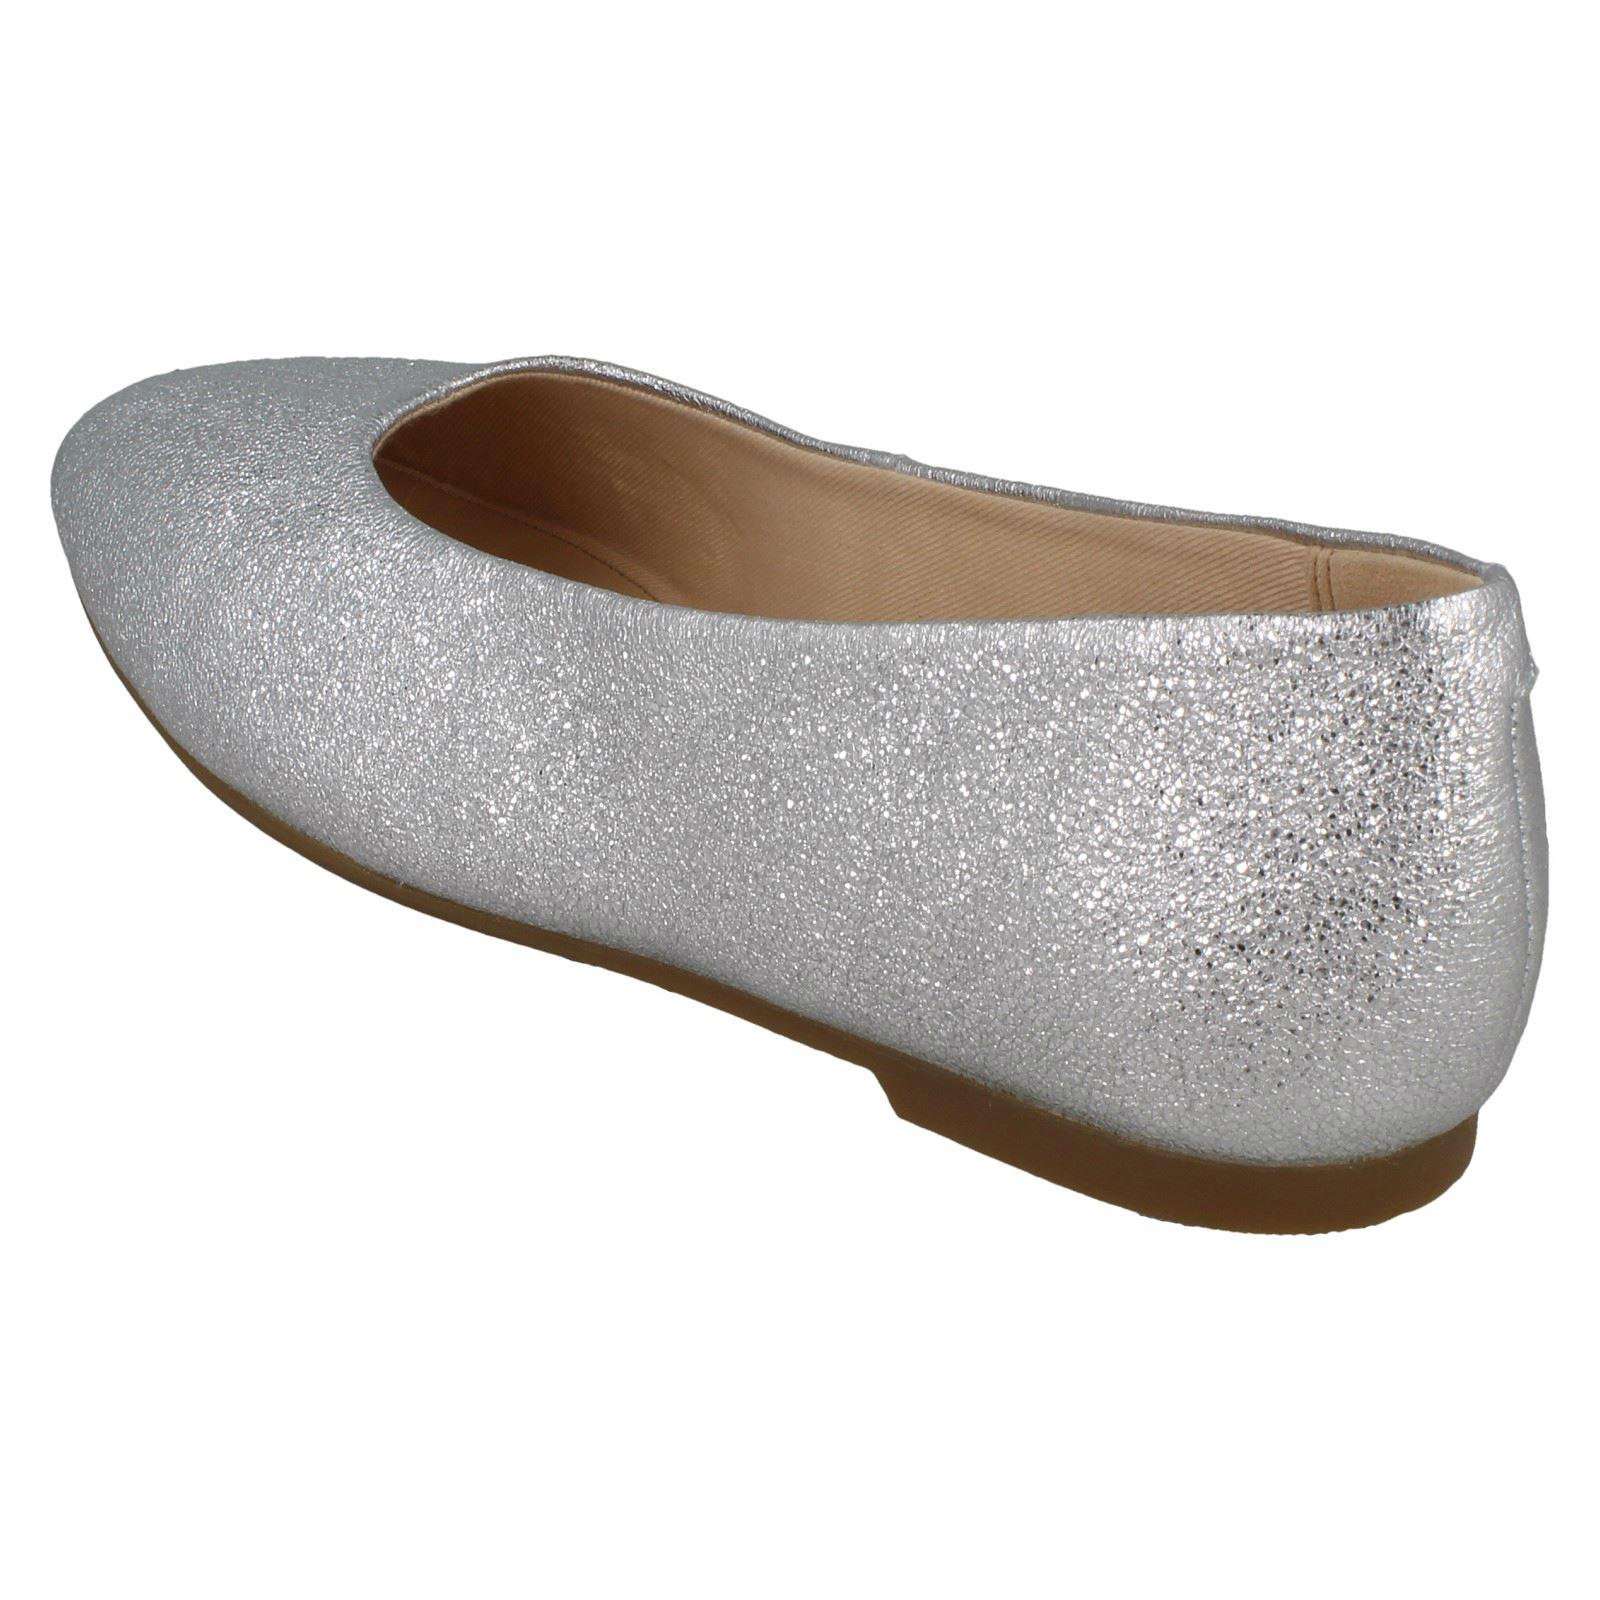 Ladies Clarks Slip On Ballerina Shoes /'Chia Violet/'